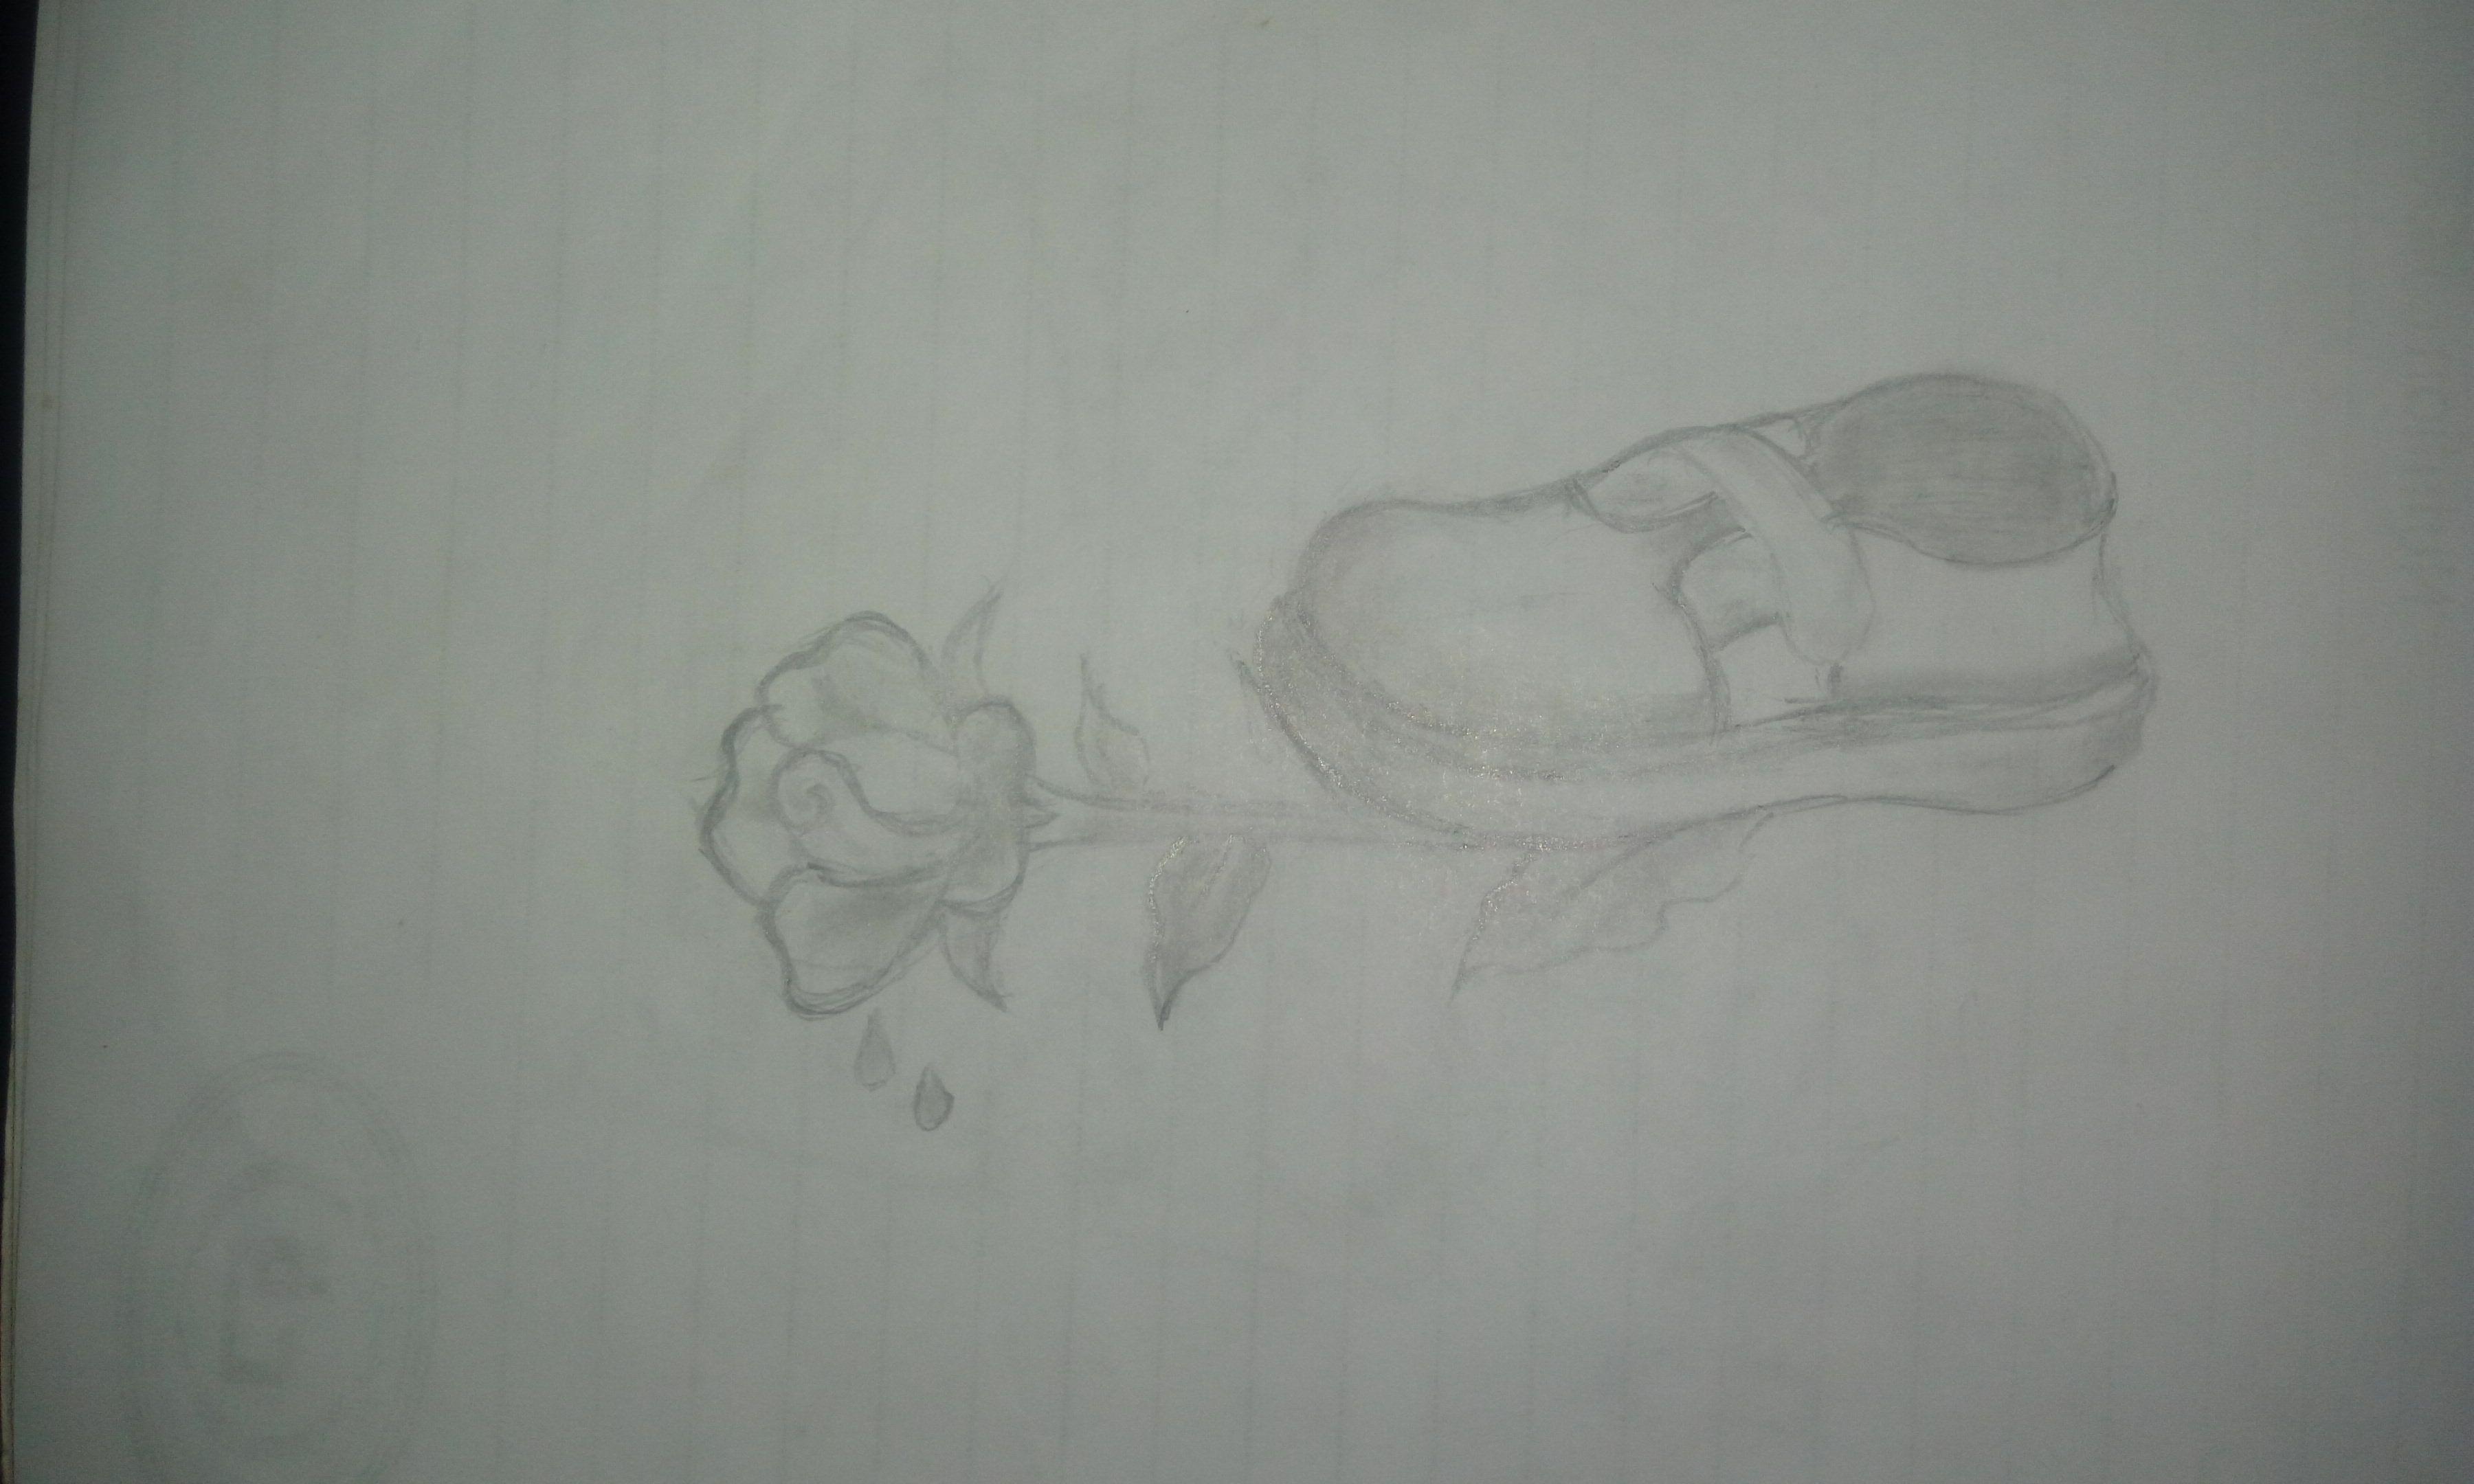 الحب وهم رسم بالرصاص Humanoid Sketch Art